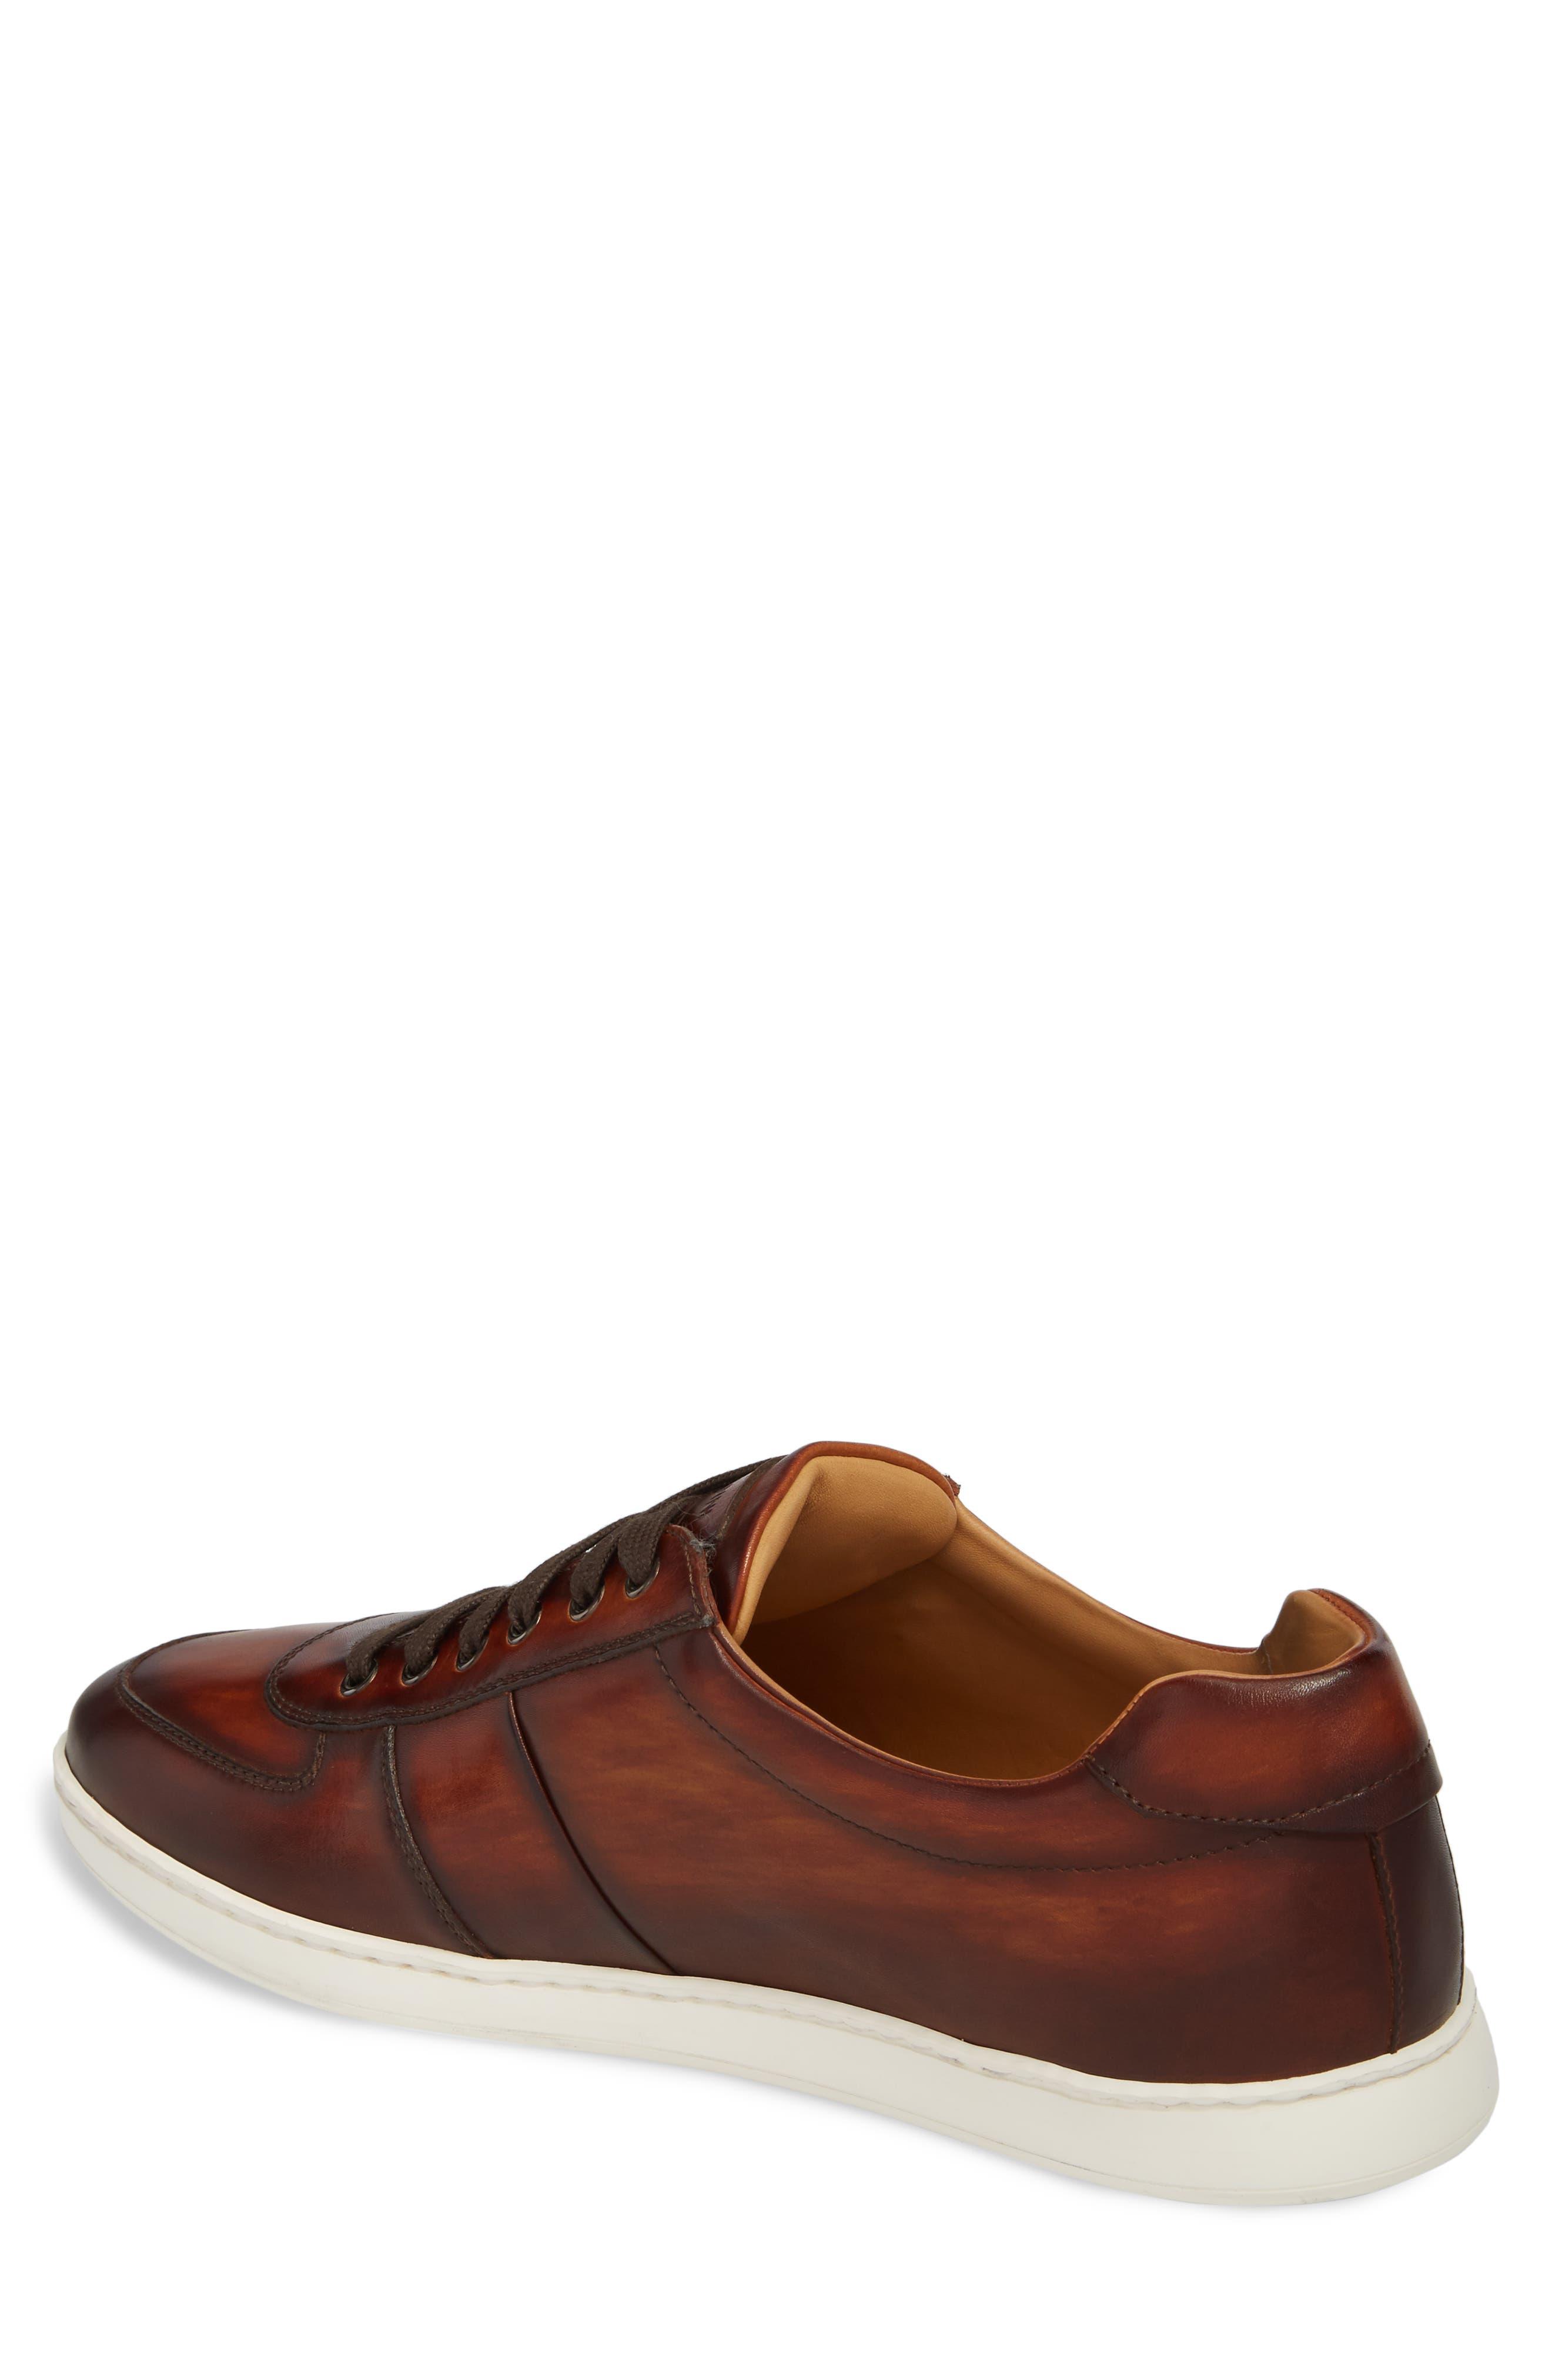 Franco Low Top Sneaker,                             Alternate thumbnail 2, color,                             COGNAC LEATHER